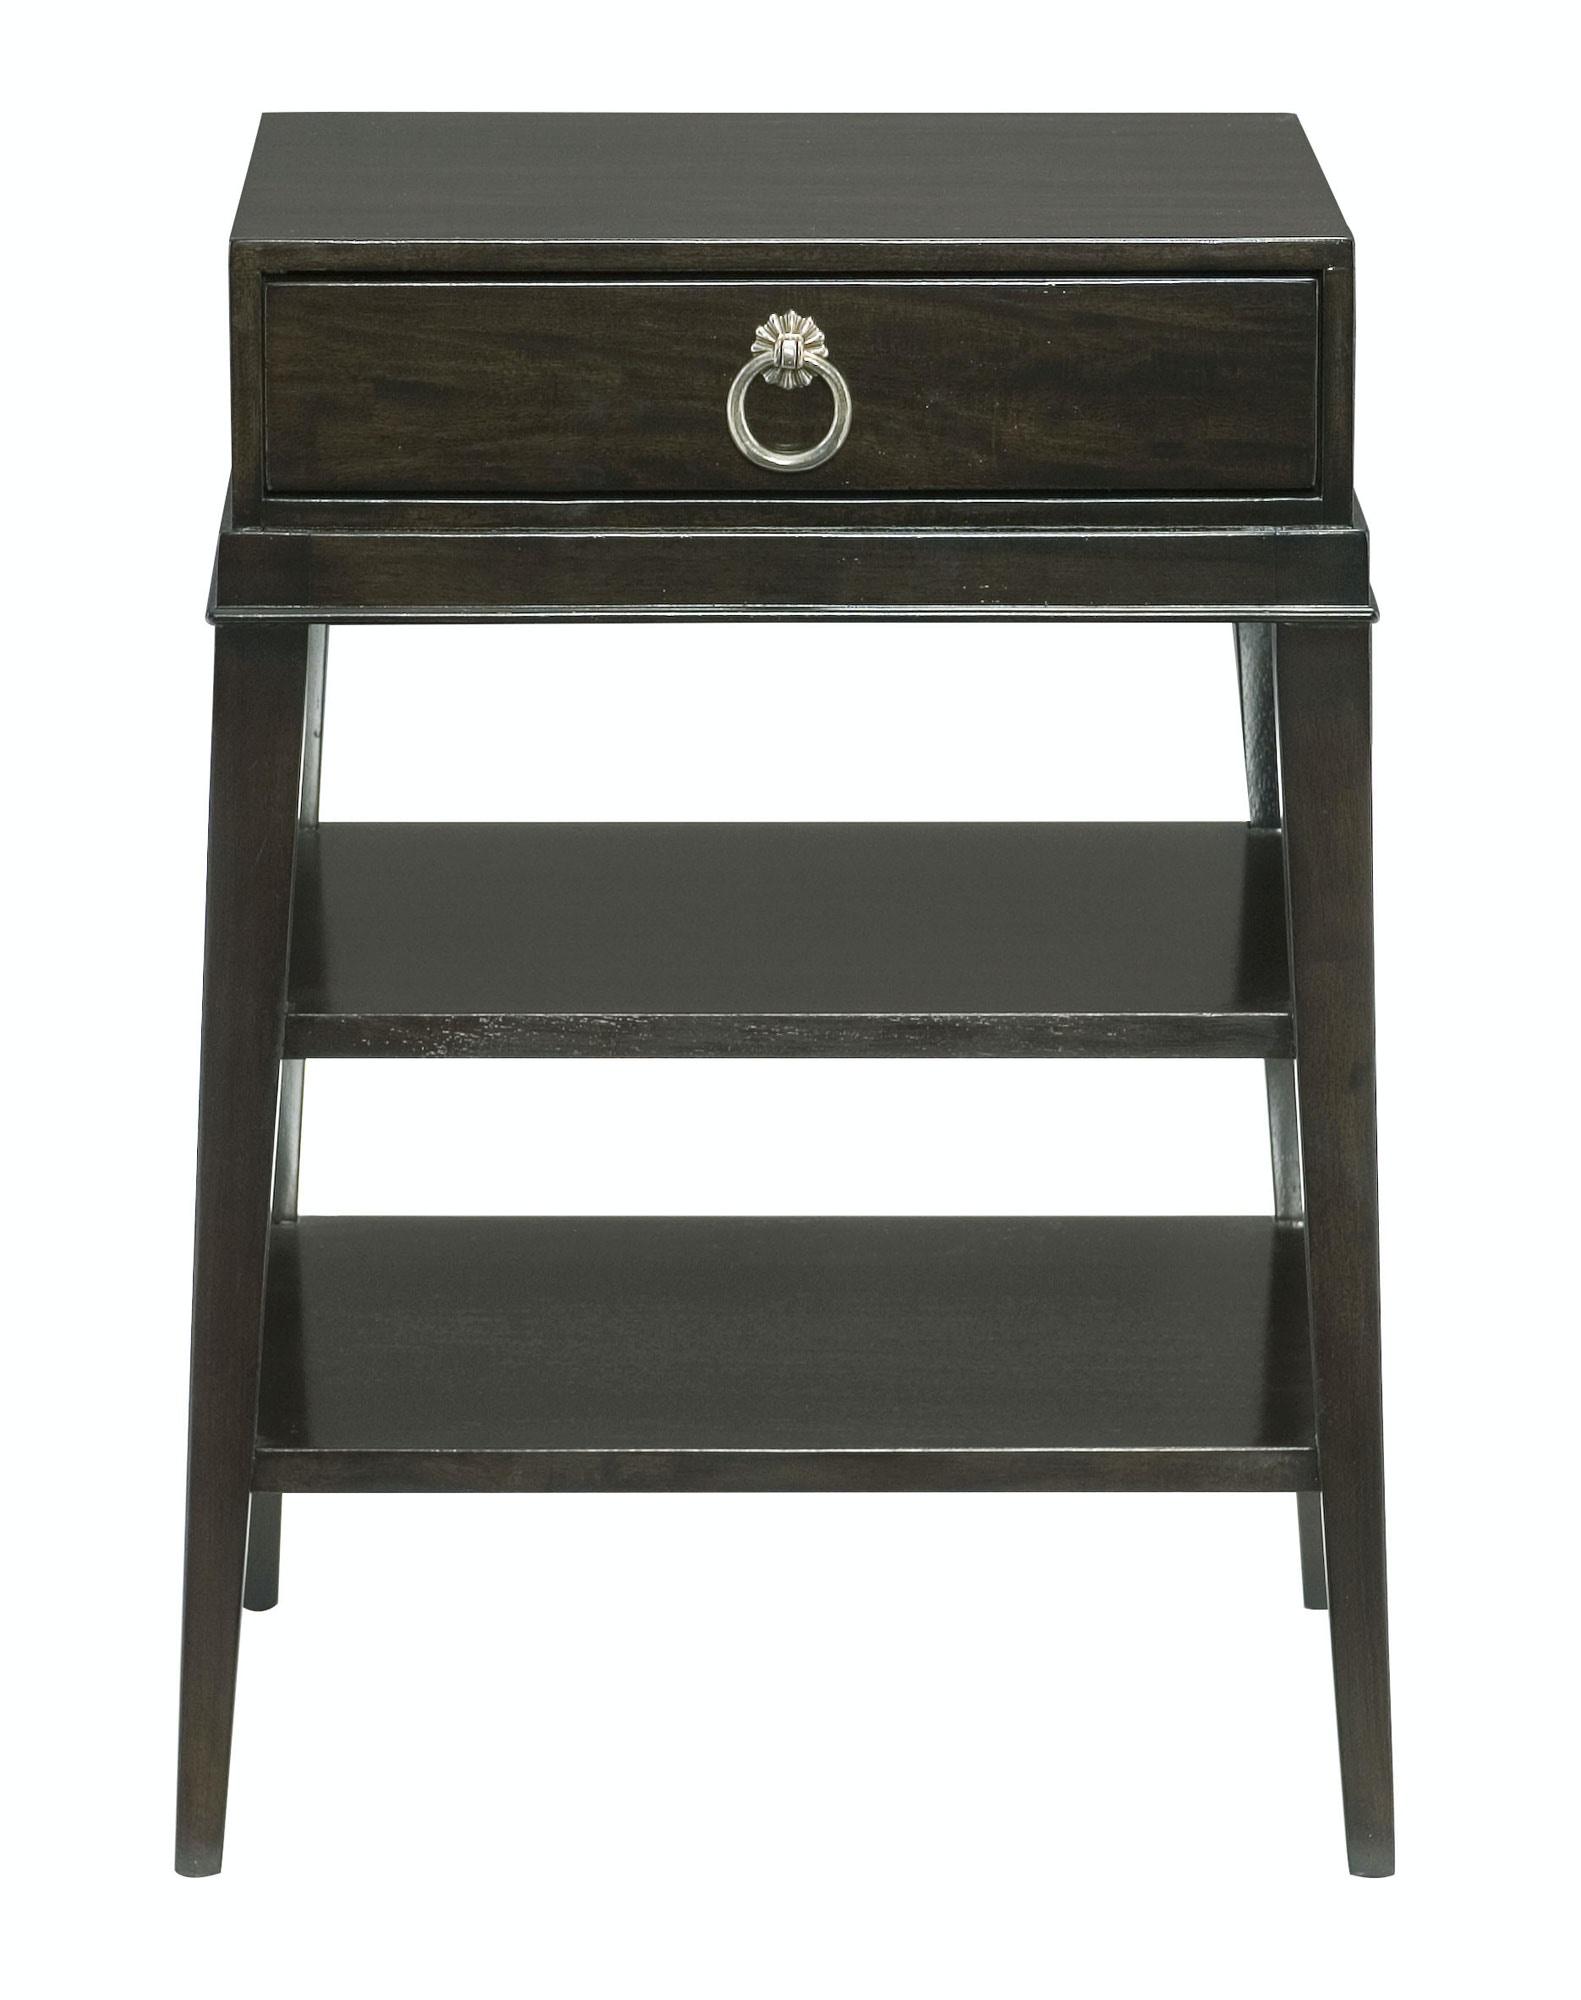 Bernhardt Furniture 367 124. Sutton House End Table